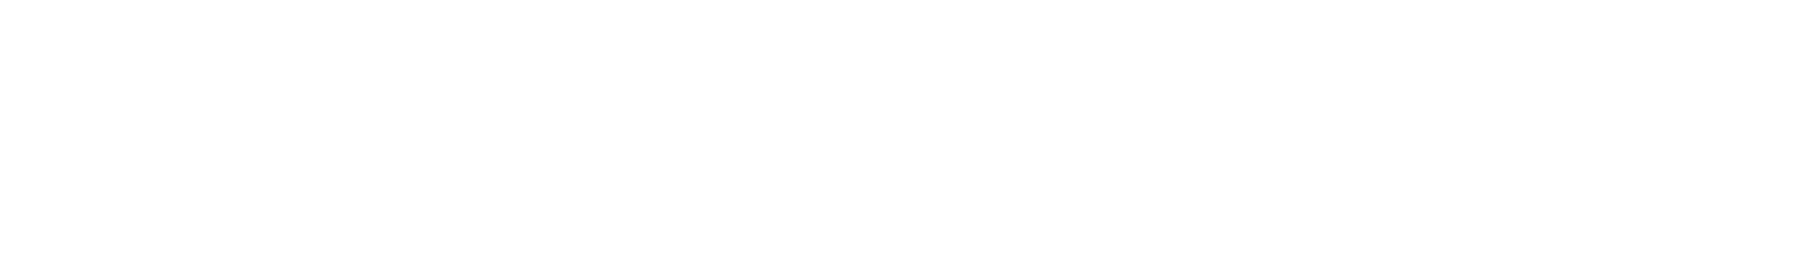 128 d